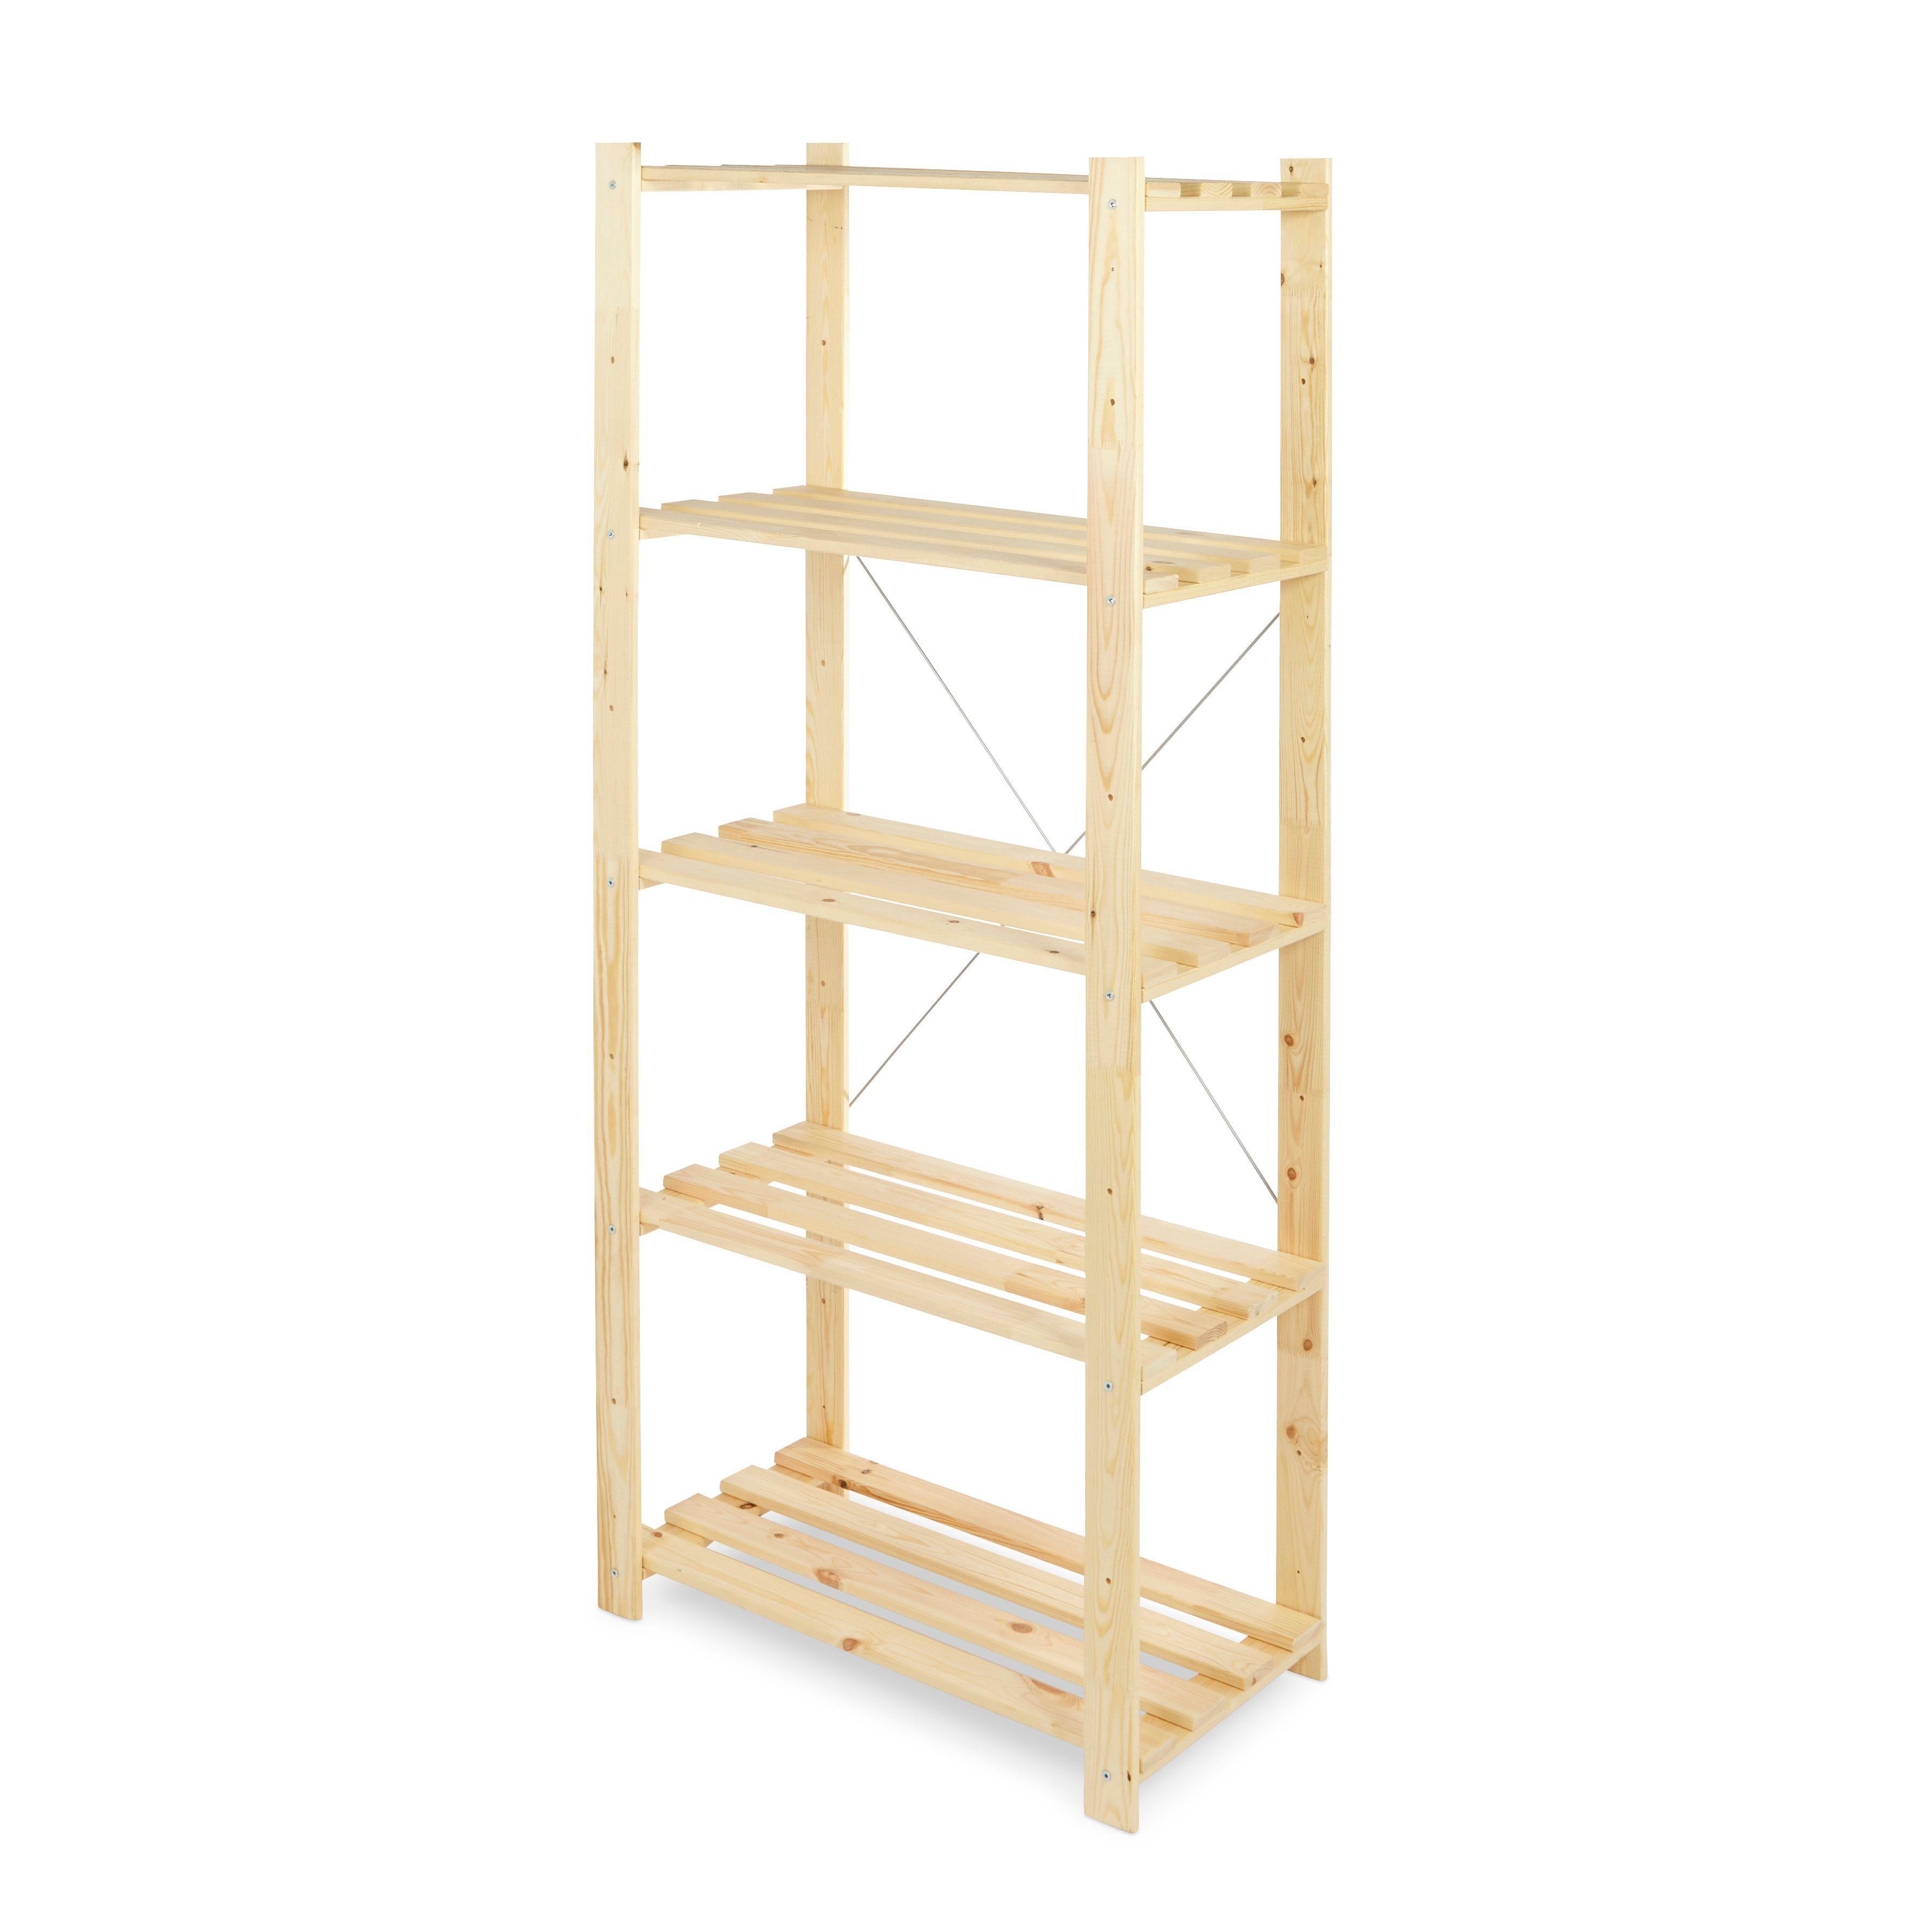 Form Symbios 5 Shelf Wood Shelving Unit B Q For All Your Home